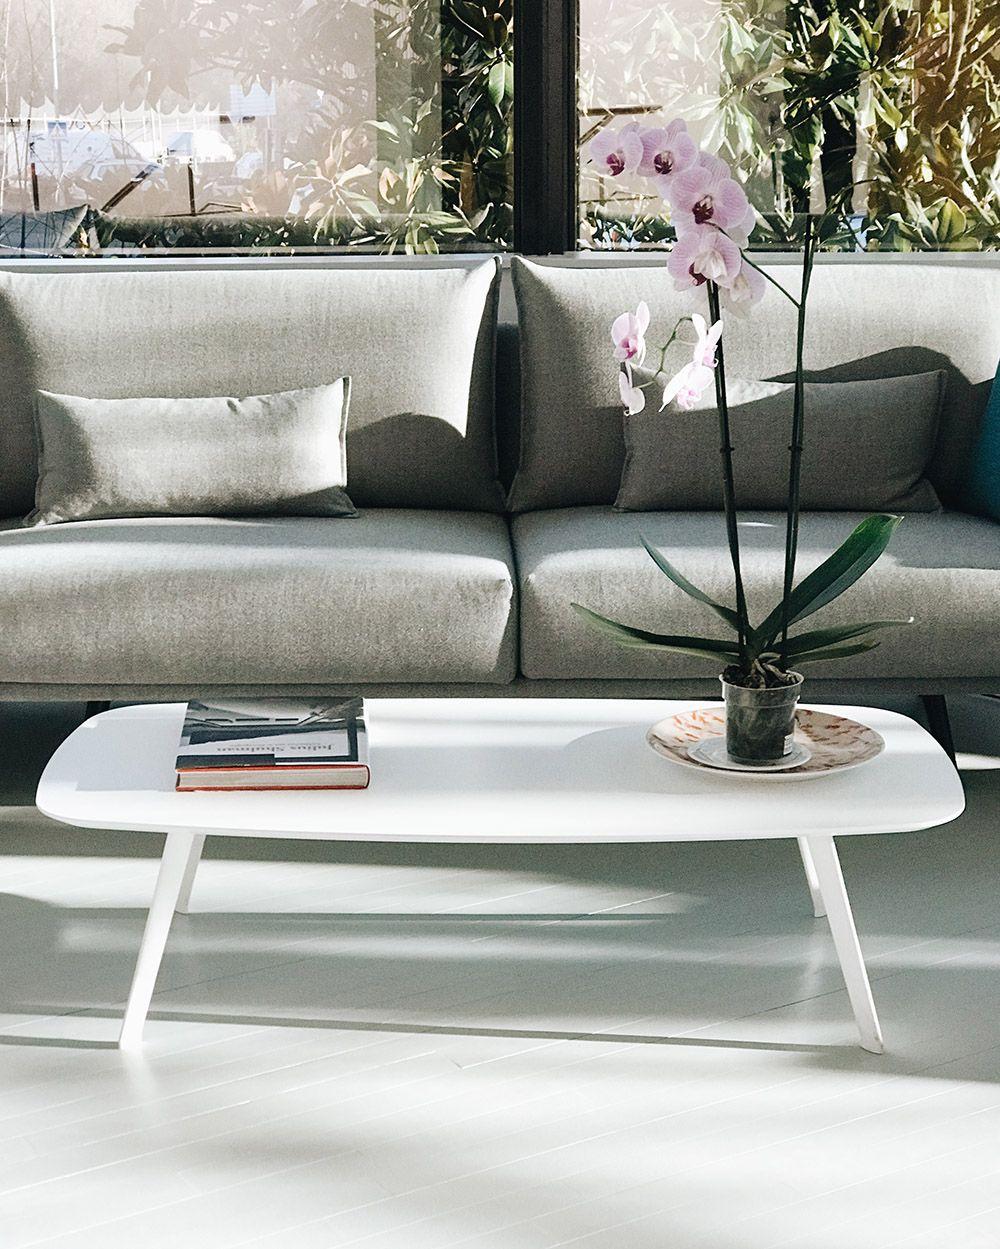 Stua Solapa Coffee Table Luxury Furniture Living Room Elegant Bedroom Decor Elegant Home Decor [ 1249 x 1000 Pixel ]